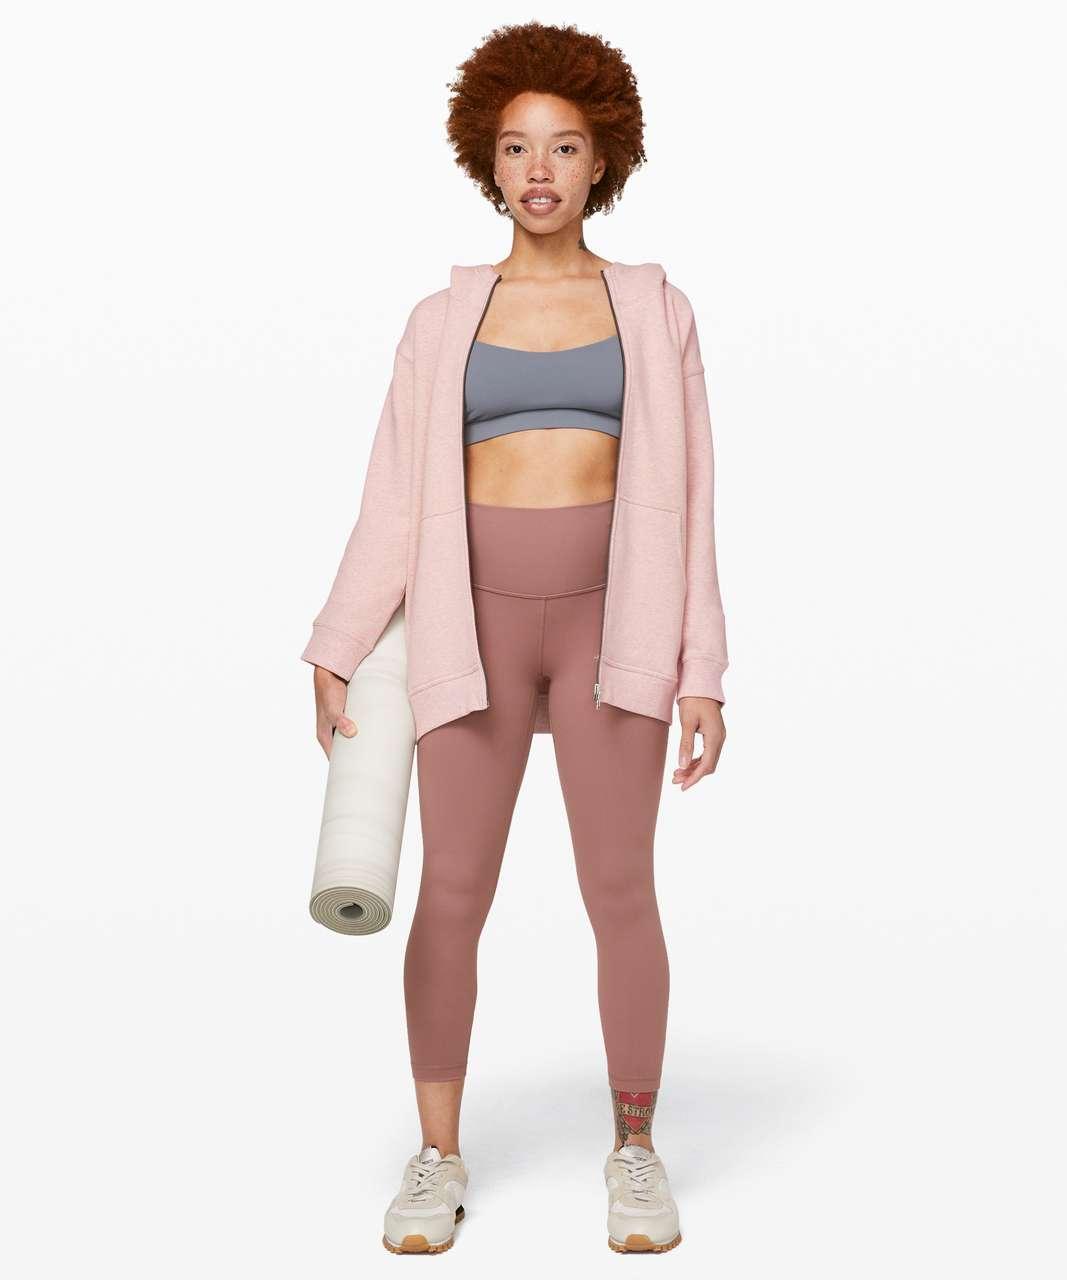 Lululemon All Yours Zip Hoodie - Heathered Mink Berry / Mink Berry